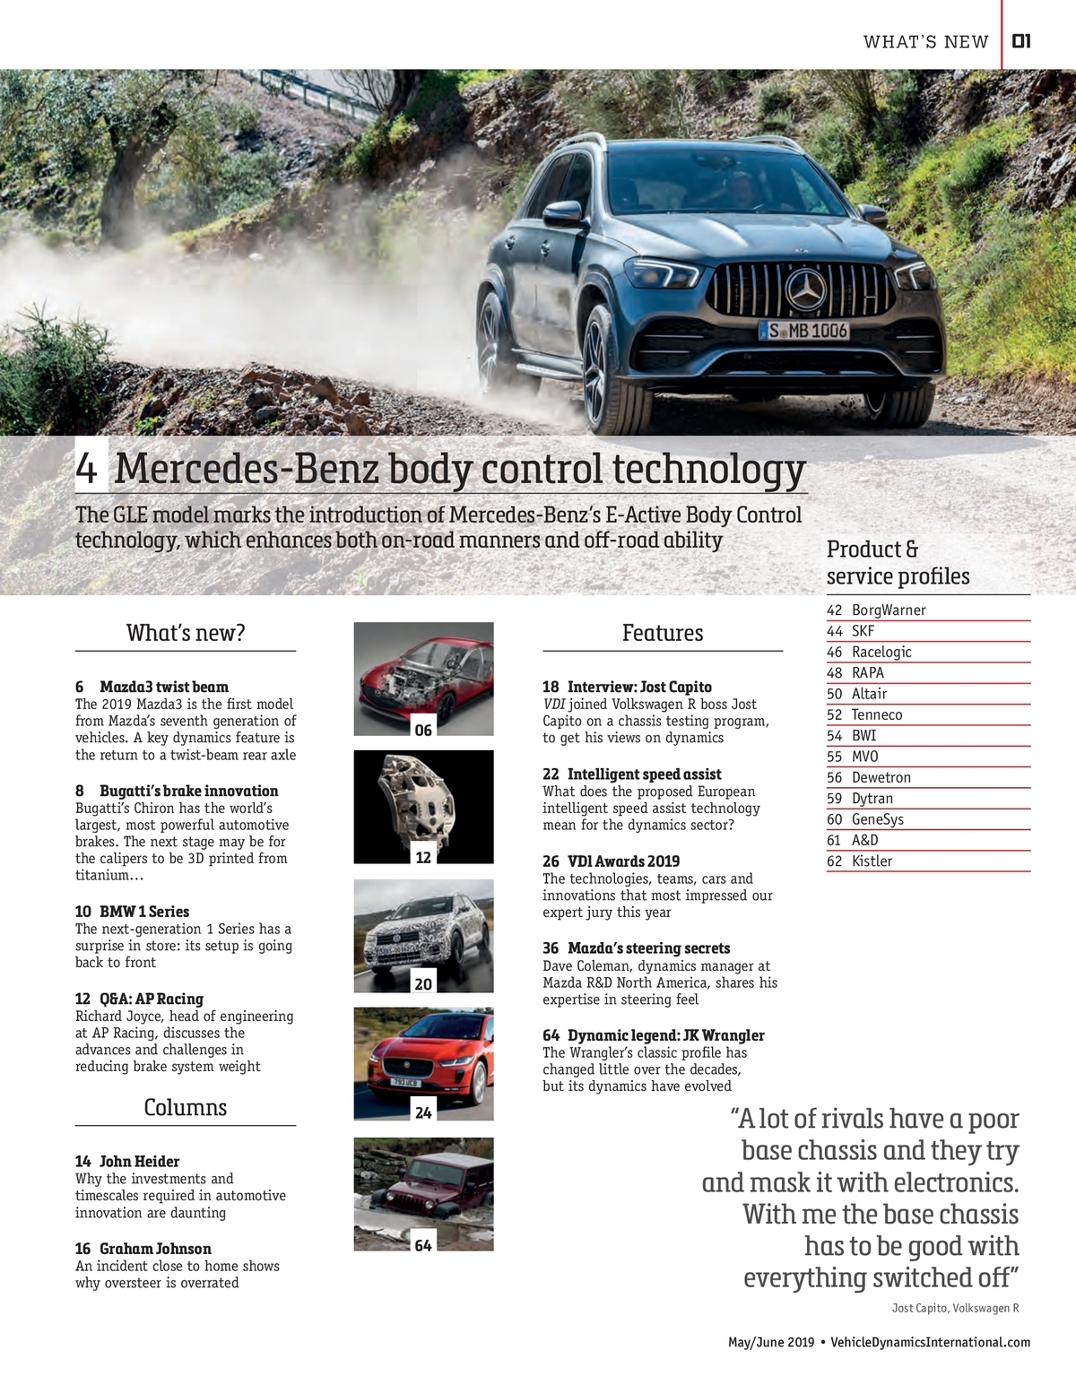 Vehicle Dynamics International - May-June 2019